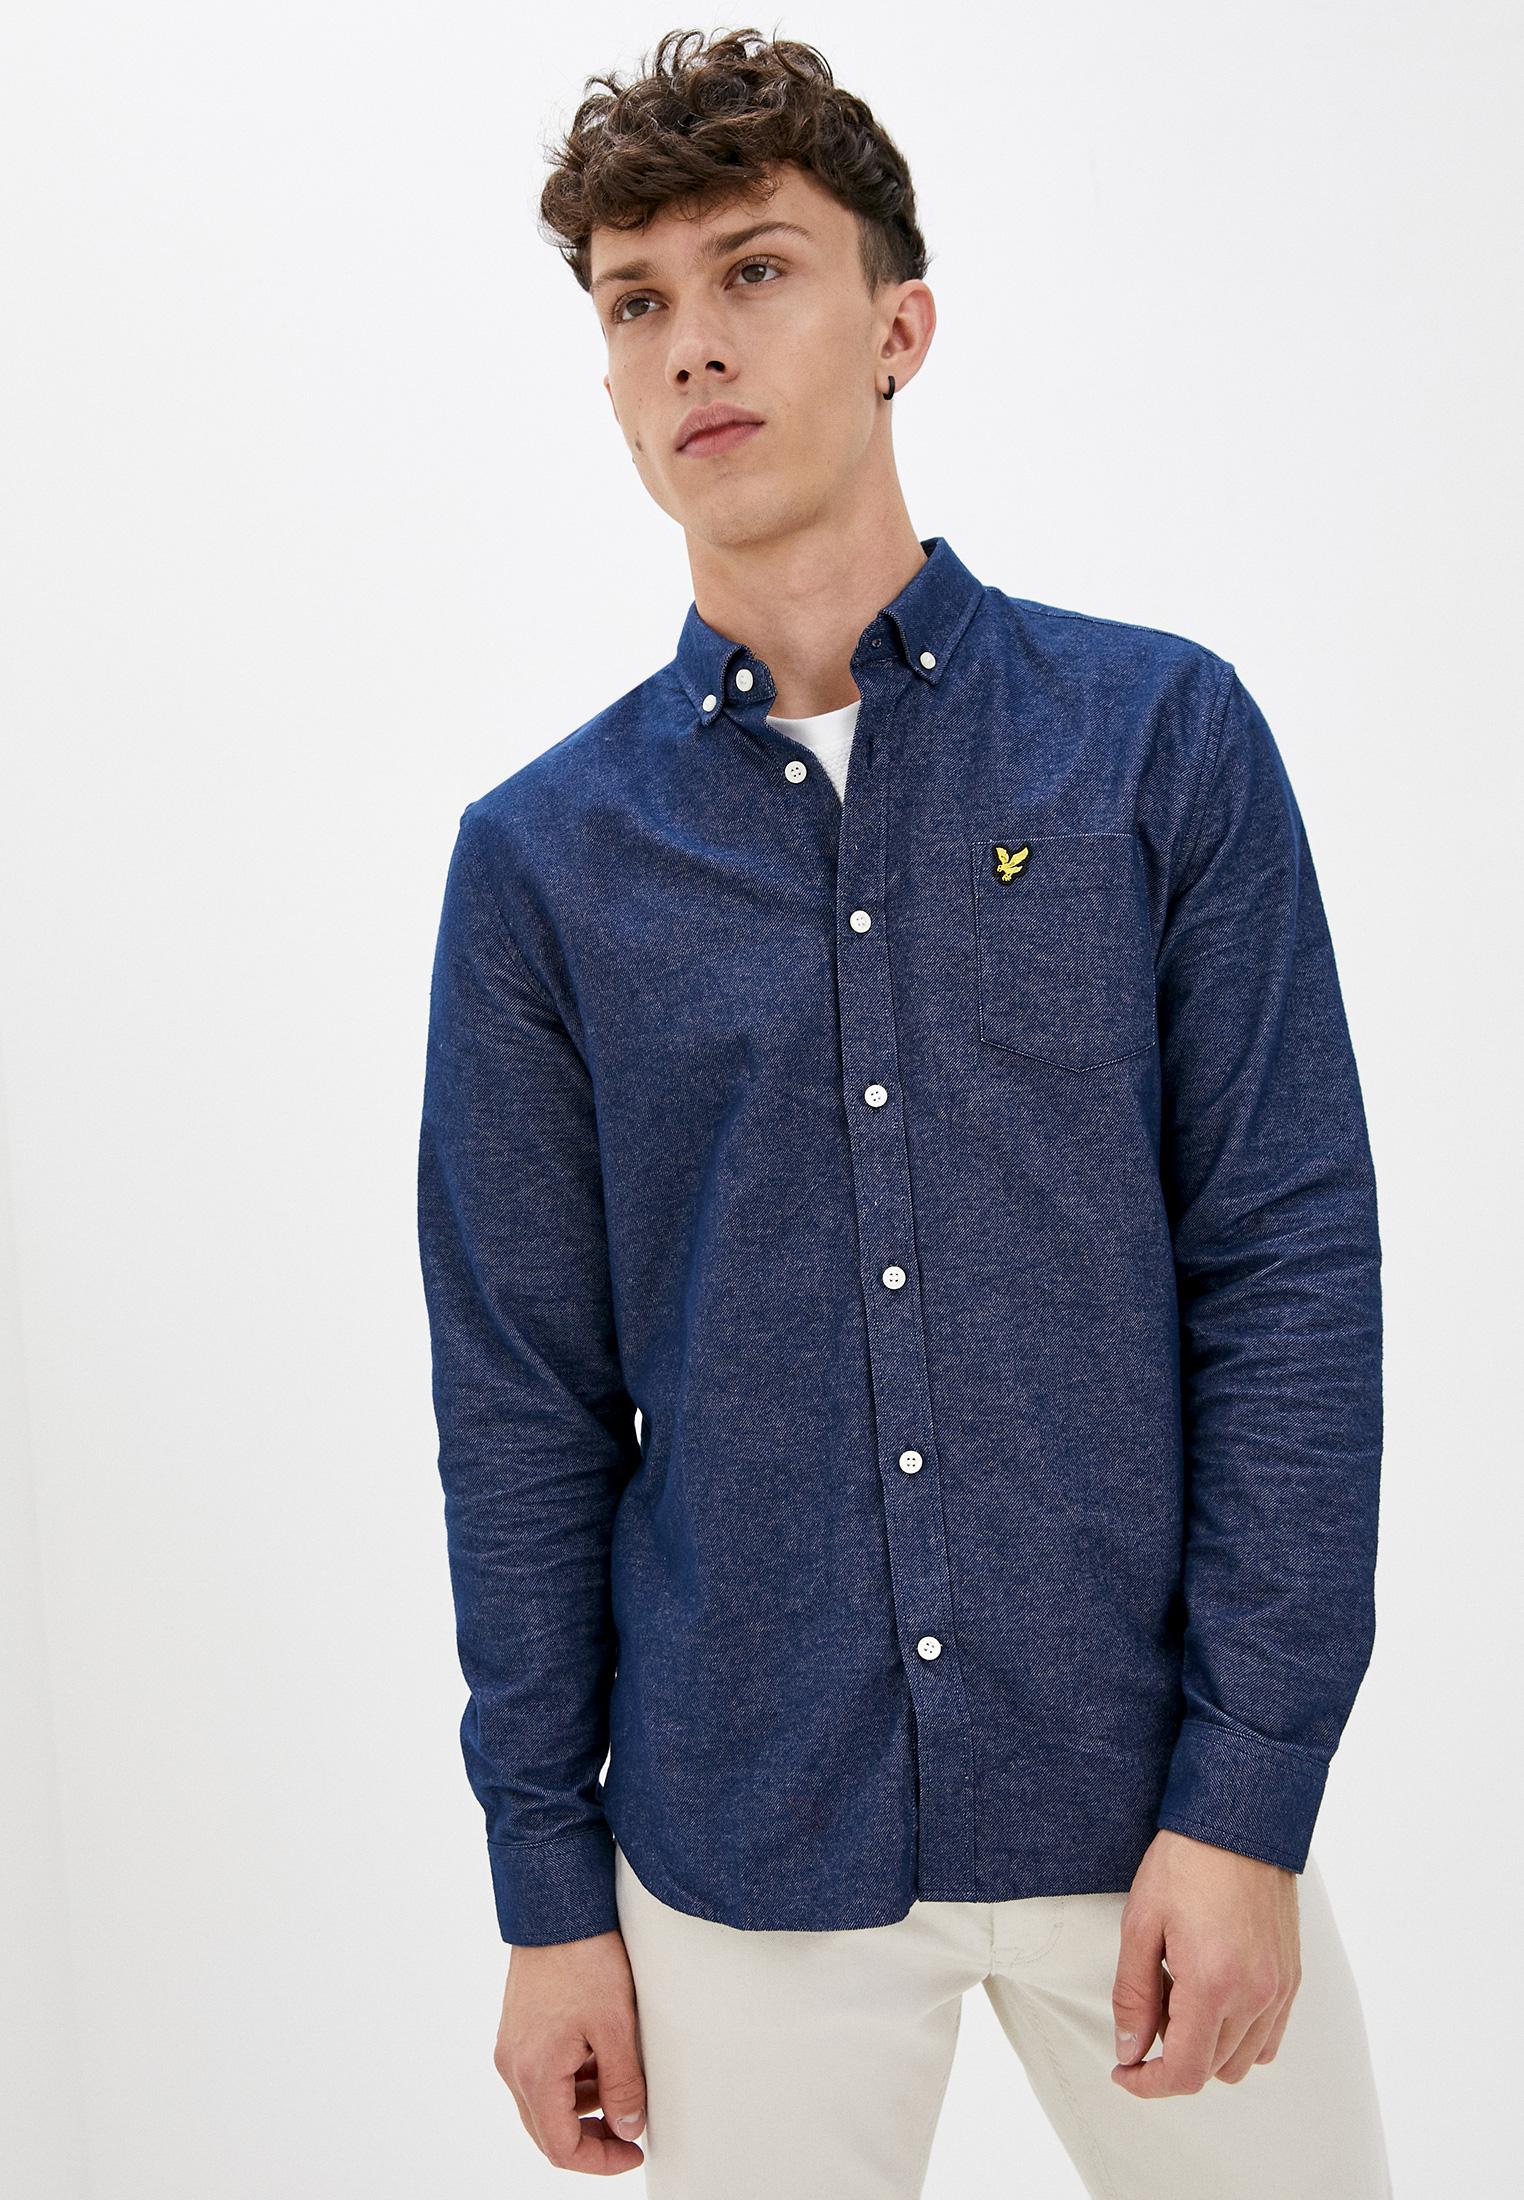 Рубашка джинсовая Lyle & Scott Mottled Shirt за 4 245 ₽. в интернет-магазине Lamoda.ru